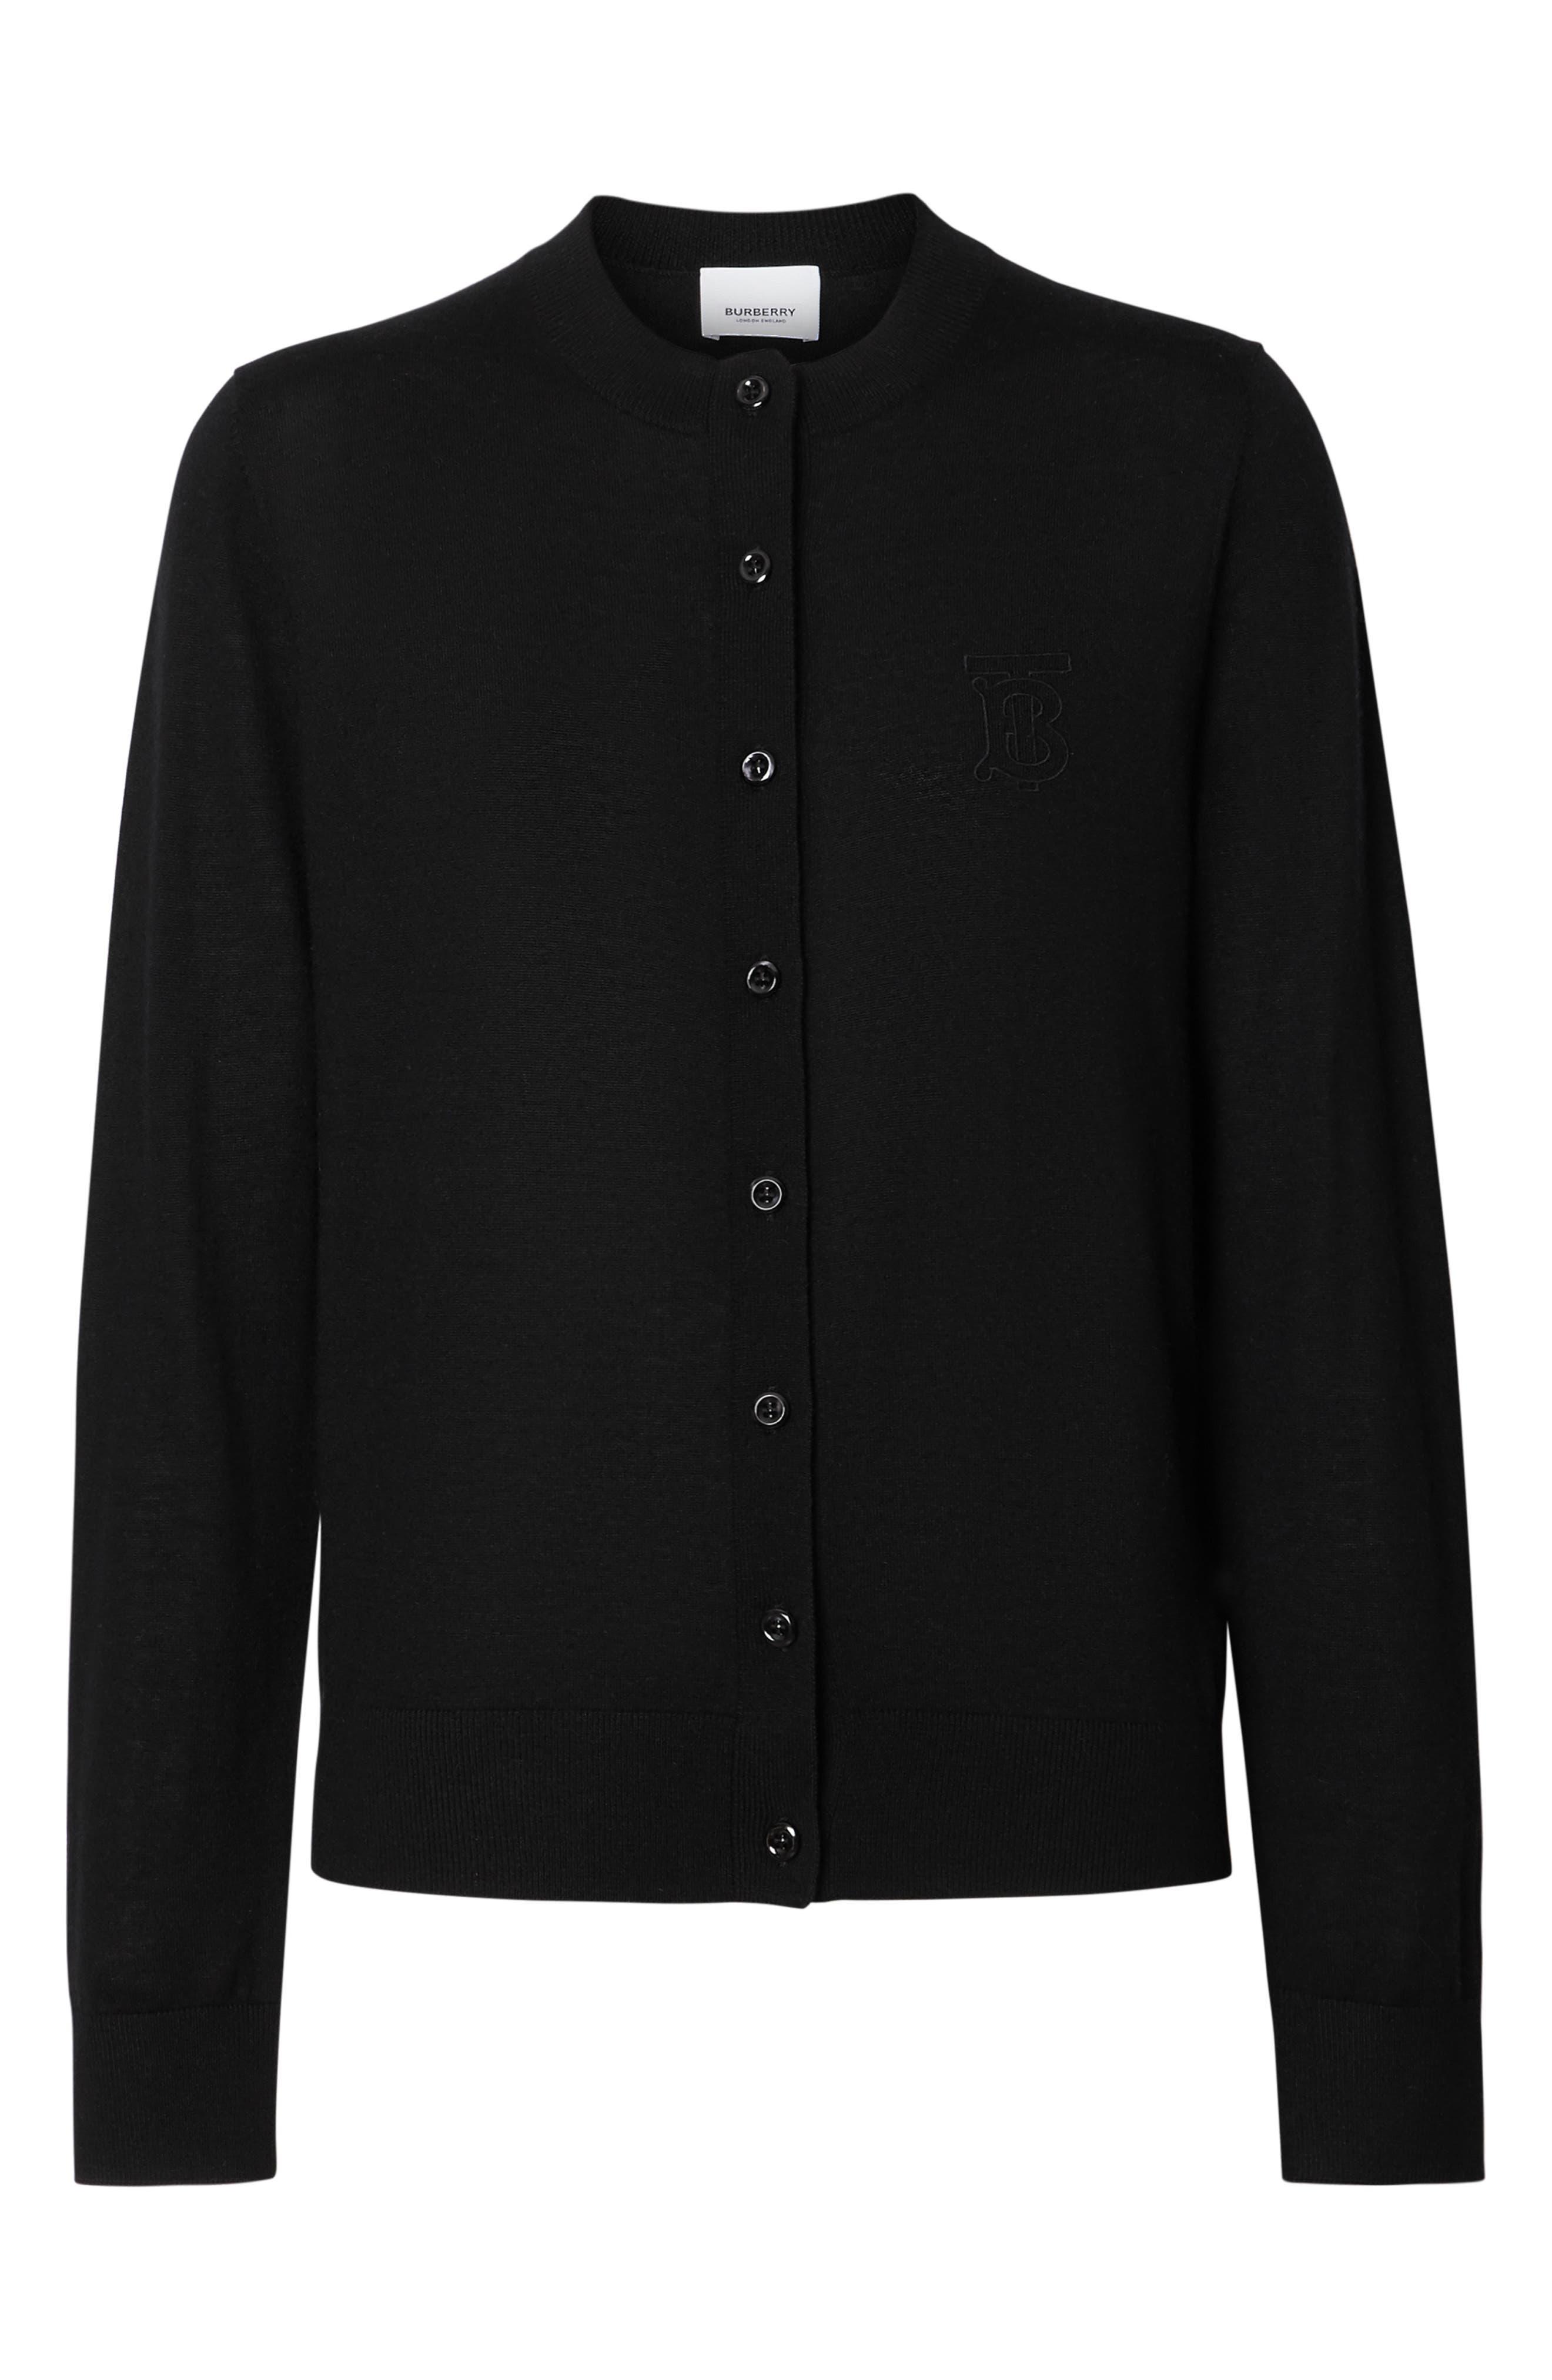 BURBERRY, Monogram Logo Cashmere Cardigan, Alternate thumbnail 5, color, BLACK